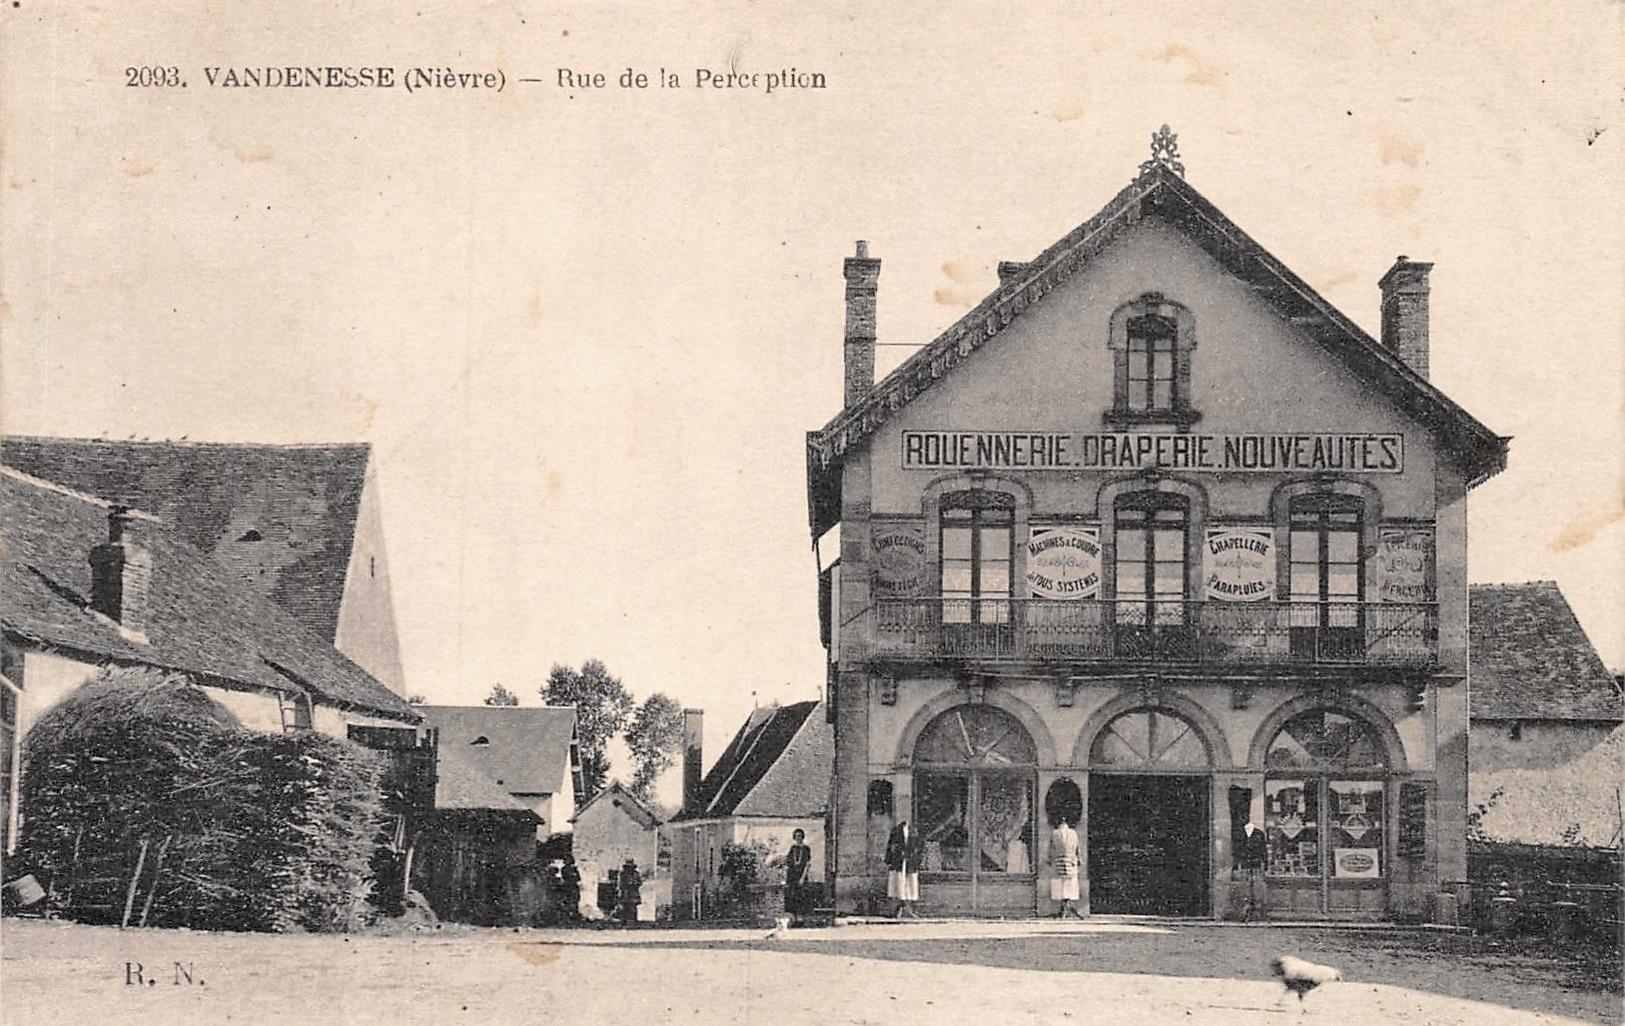 Vandenesse (Nièvre) La rue de la Perception CPA